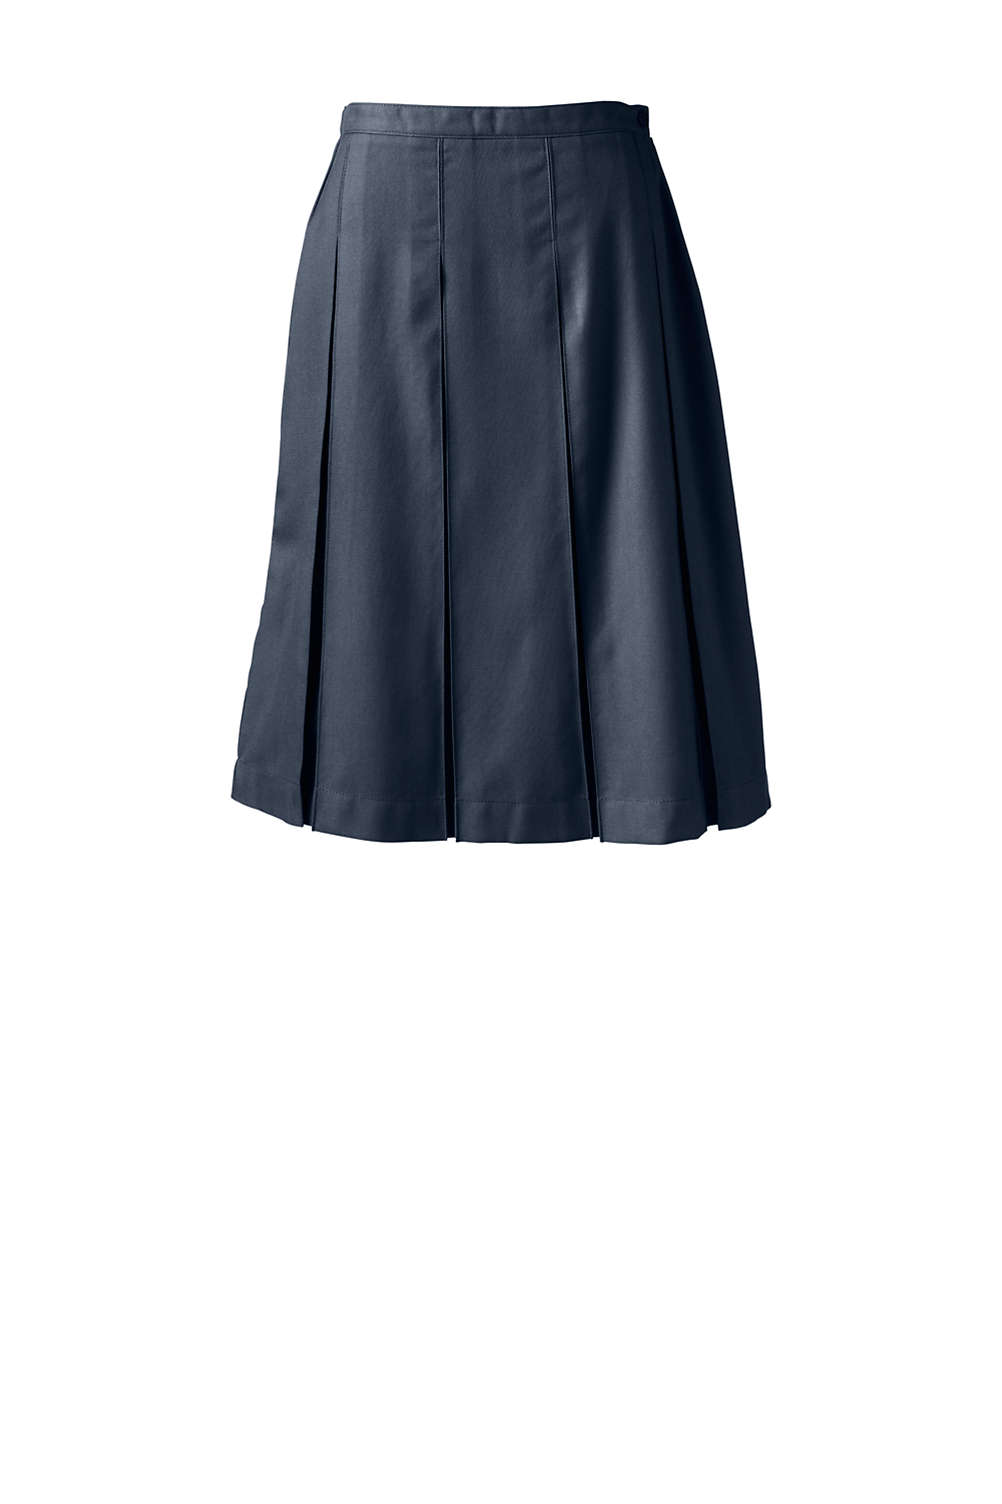 83b097c107f School Uniform Solid Box Pleat Skirt Below the Knee from Lands  End